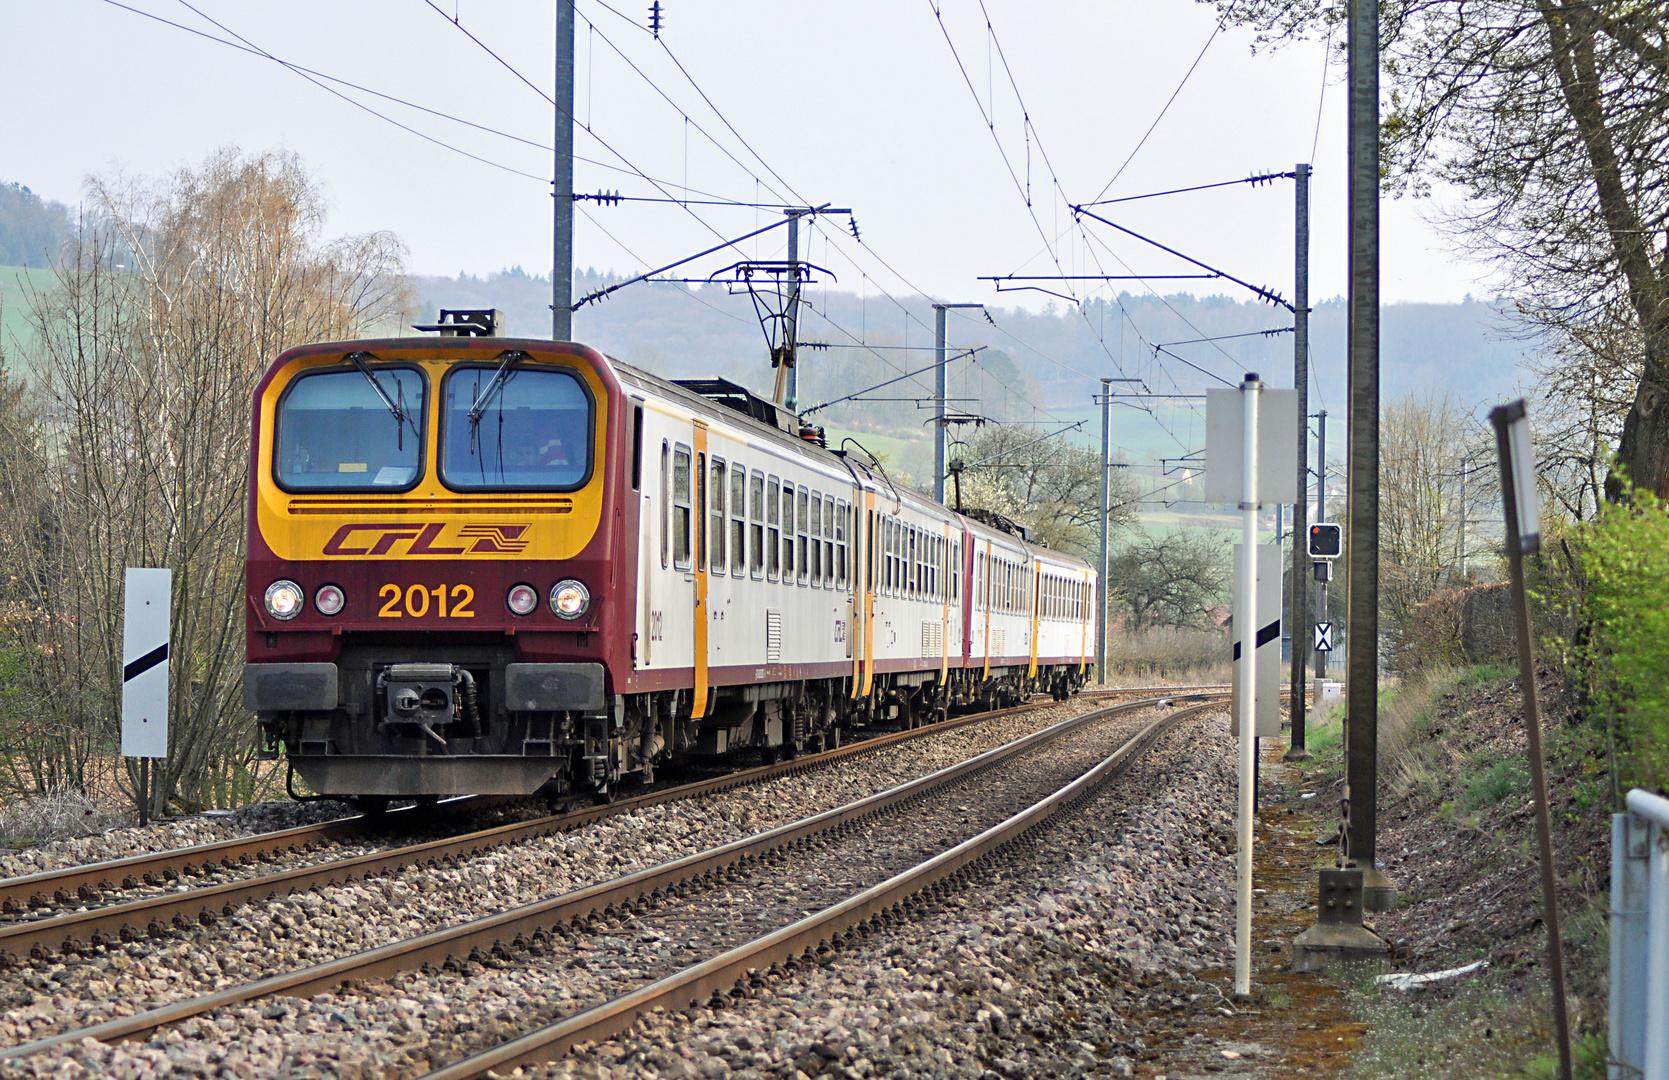 CFL 2012+2009 in Pettingen Mersch